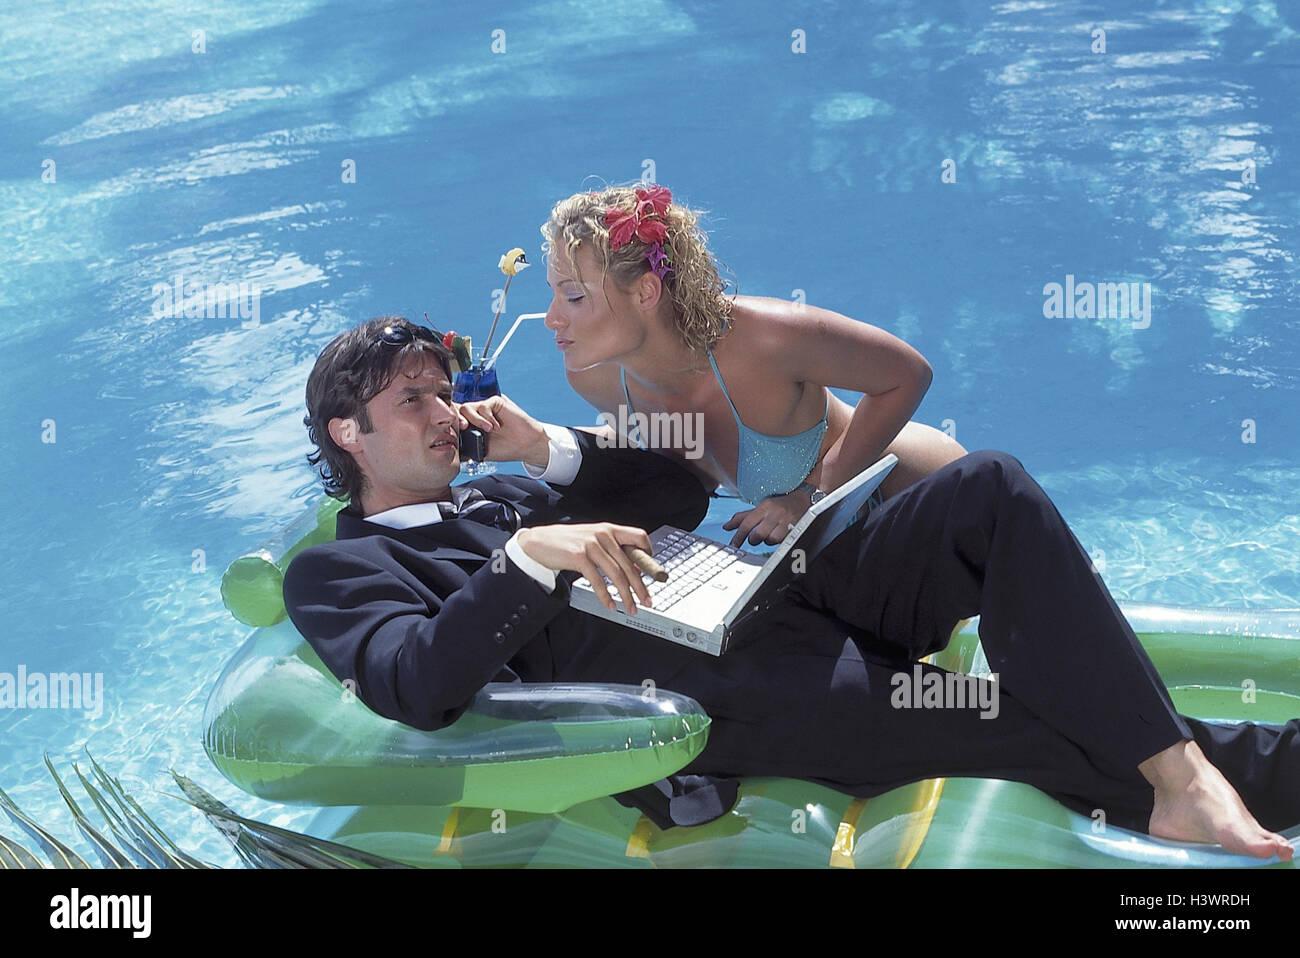 Schwimmbad, Mann, Anzug, Notebook-Computer, Handy, Zigarre